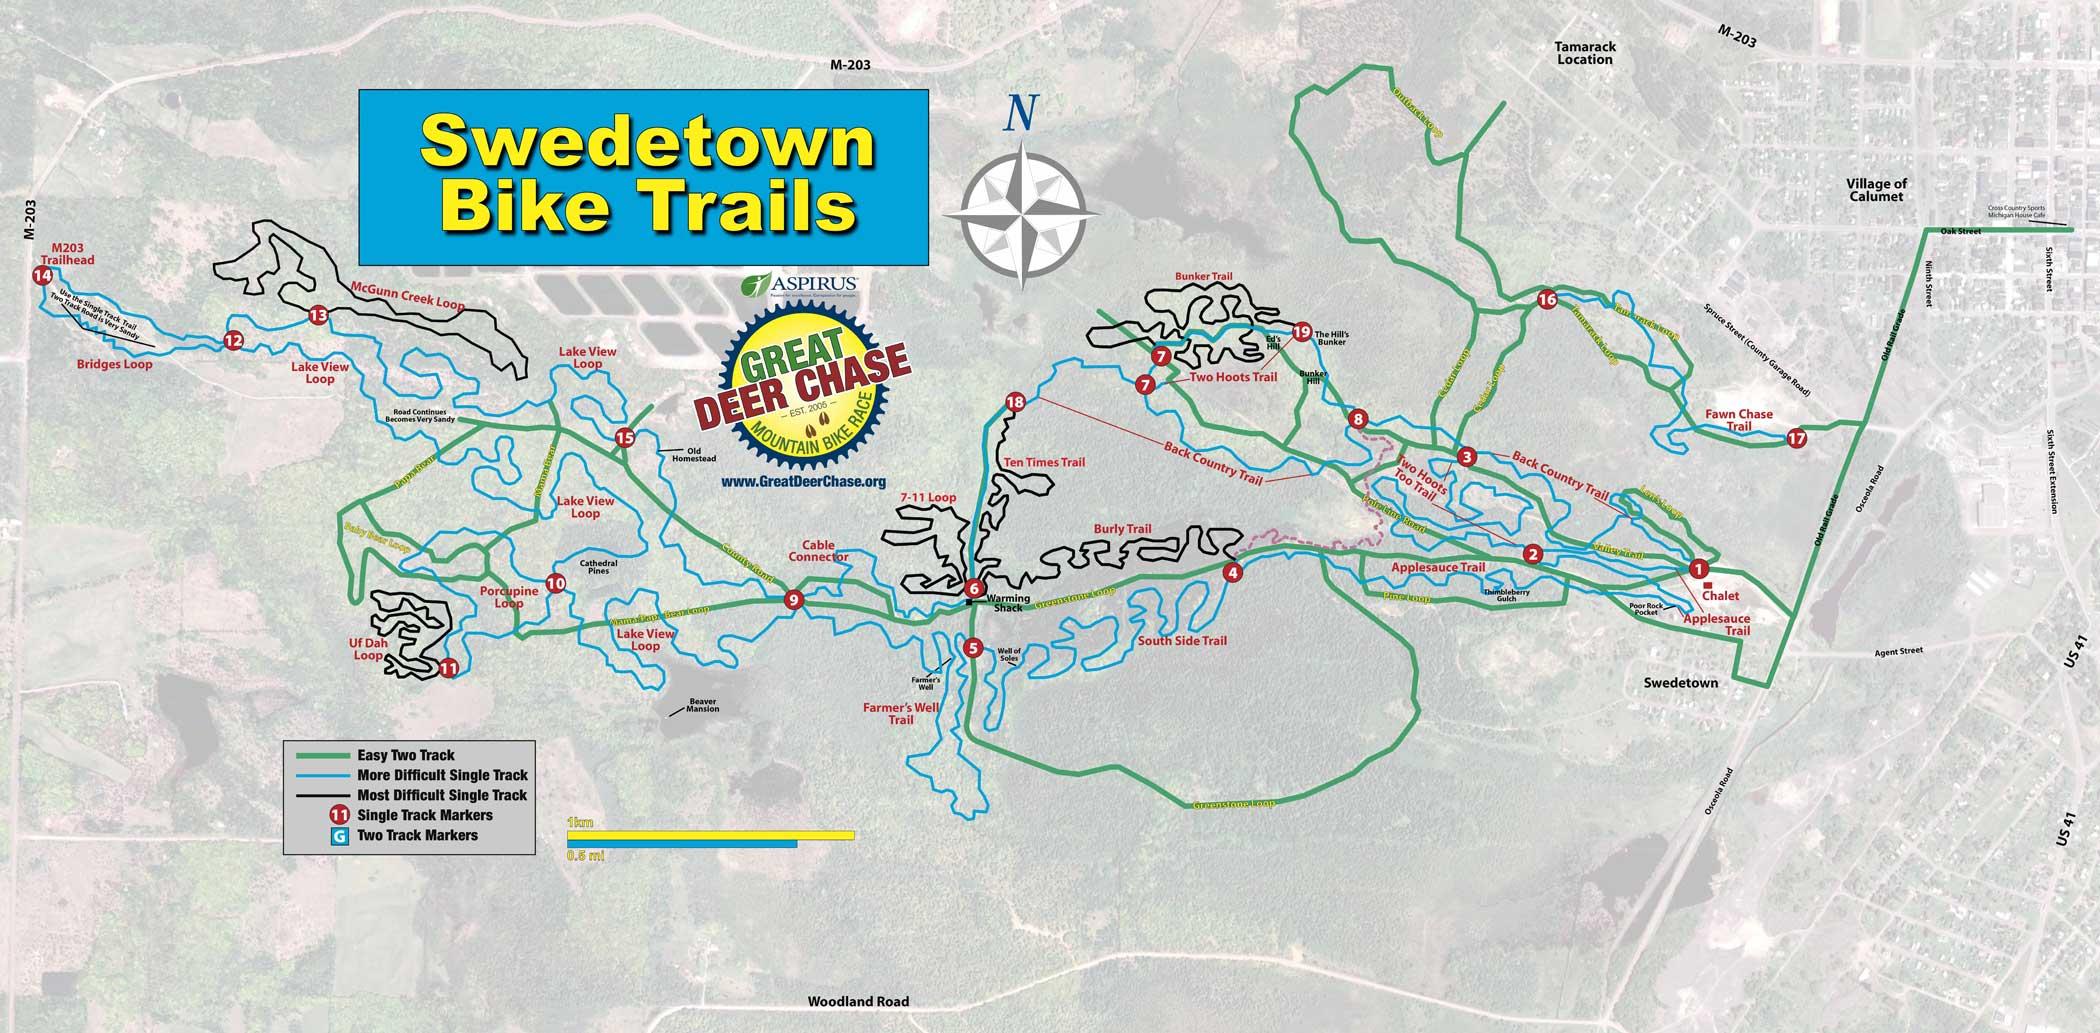 Trail Maps Swedetown Trails